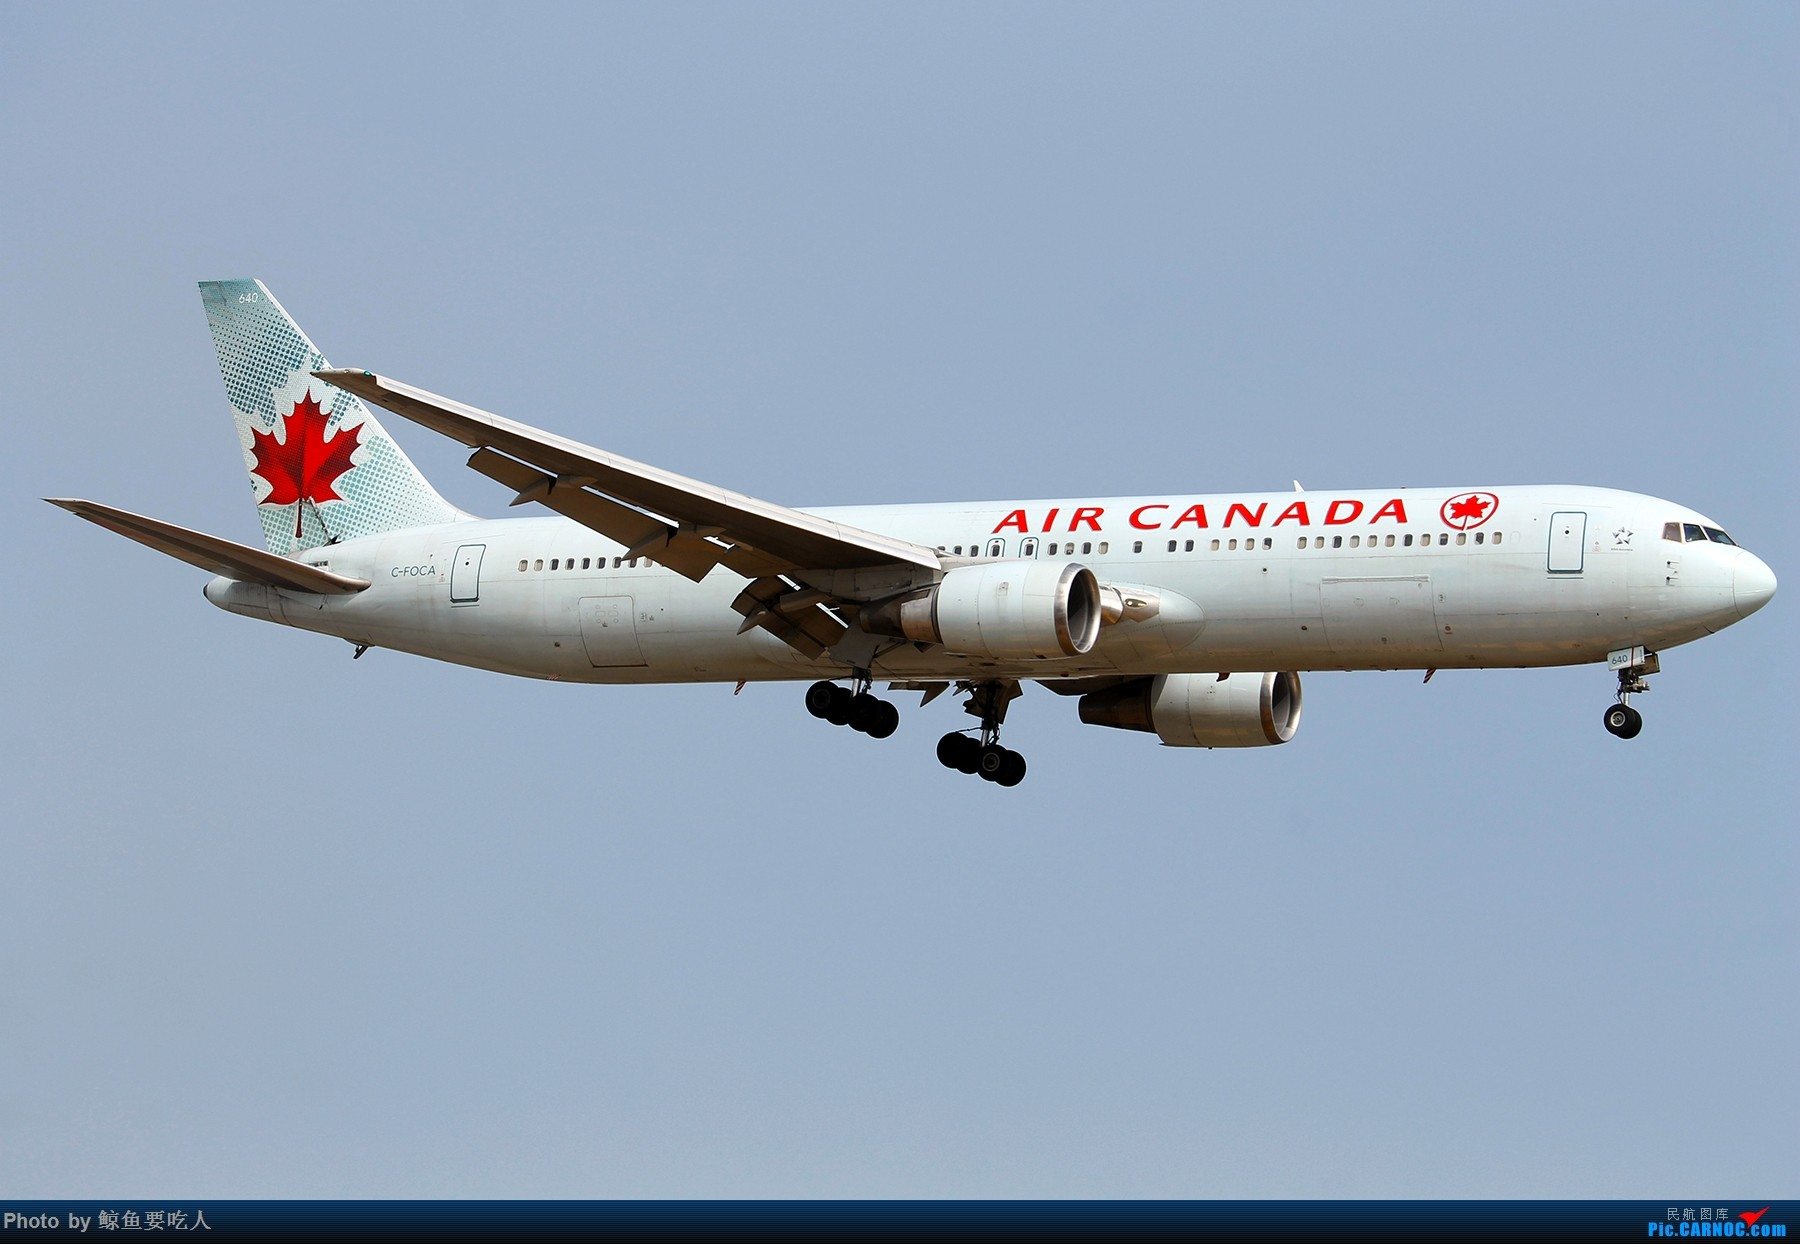 Re:[原创][Steven@YYZ] 多伦多皮尔逊国际机场晴天降落一组~~~ BOEING 767-300ER C-FOCA 多伦多皮尔逊国际机场